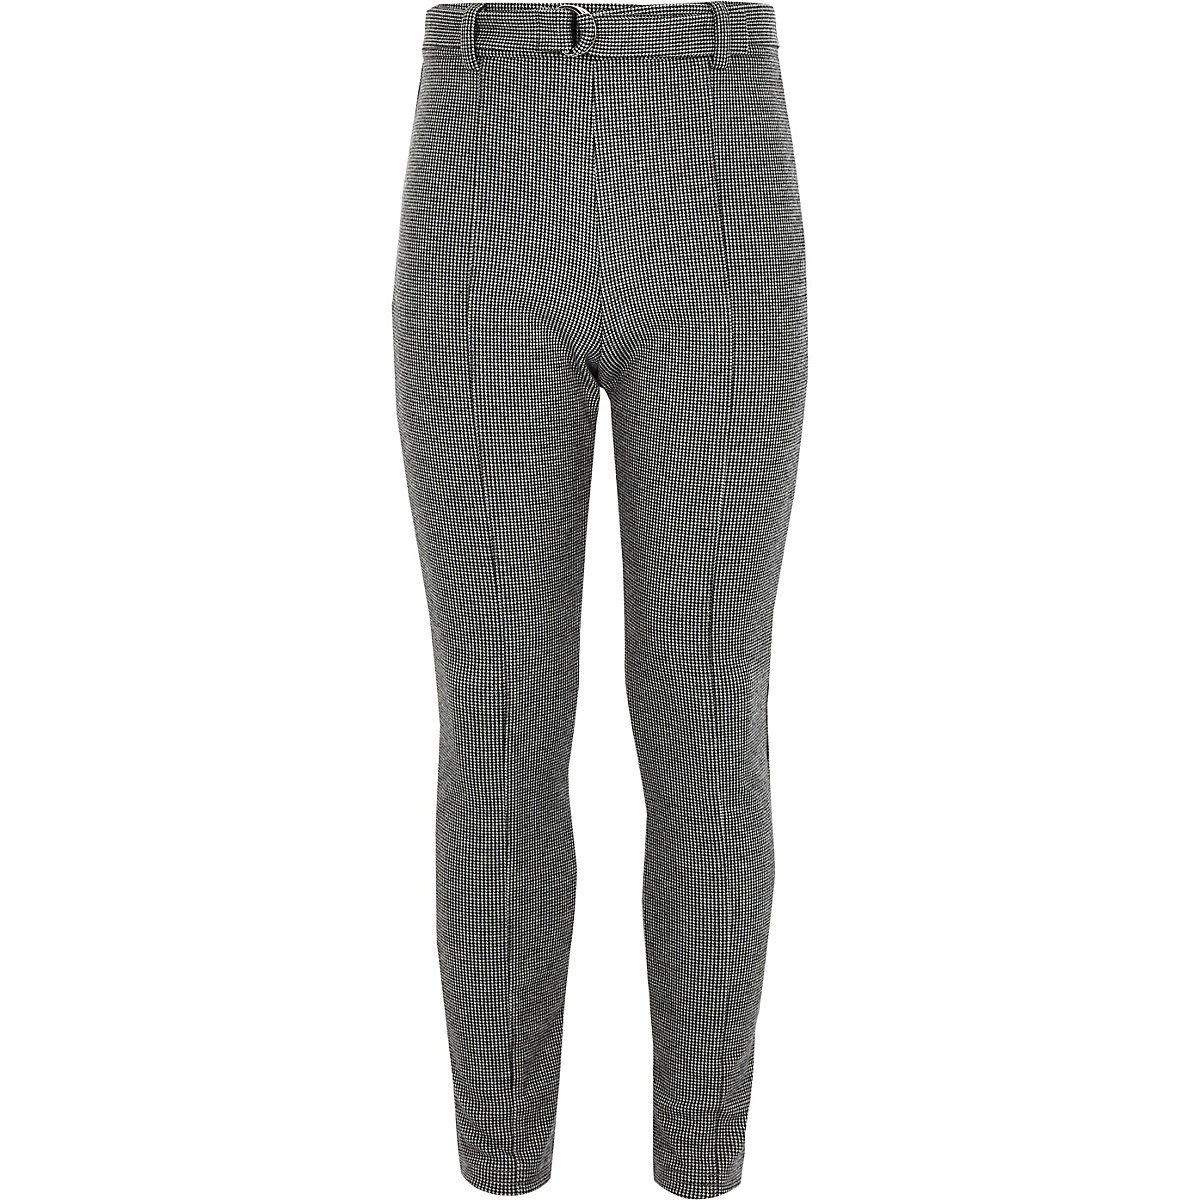 Girls grey check belted leggings